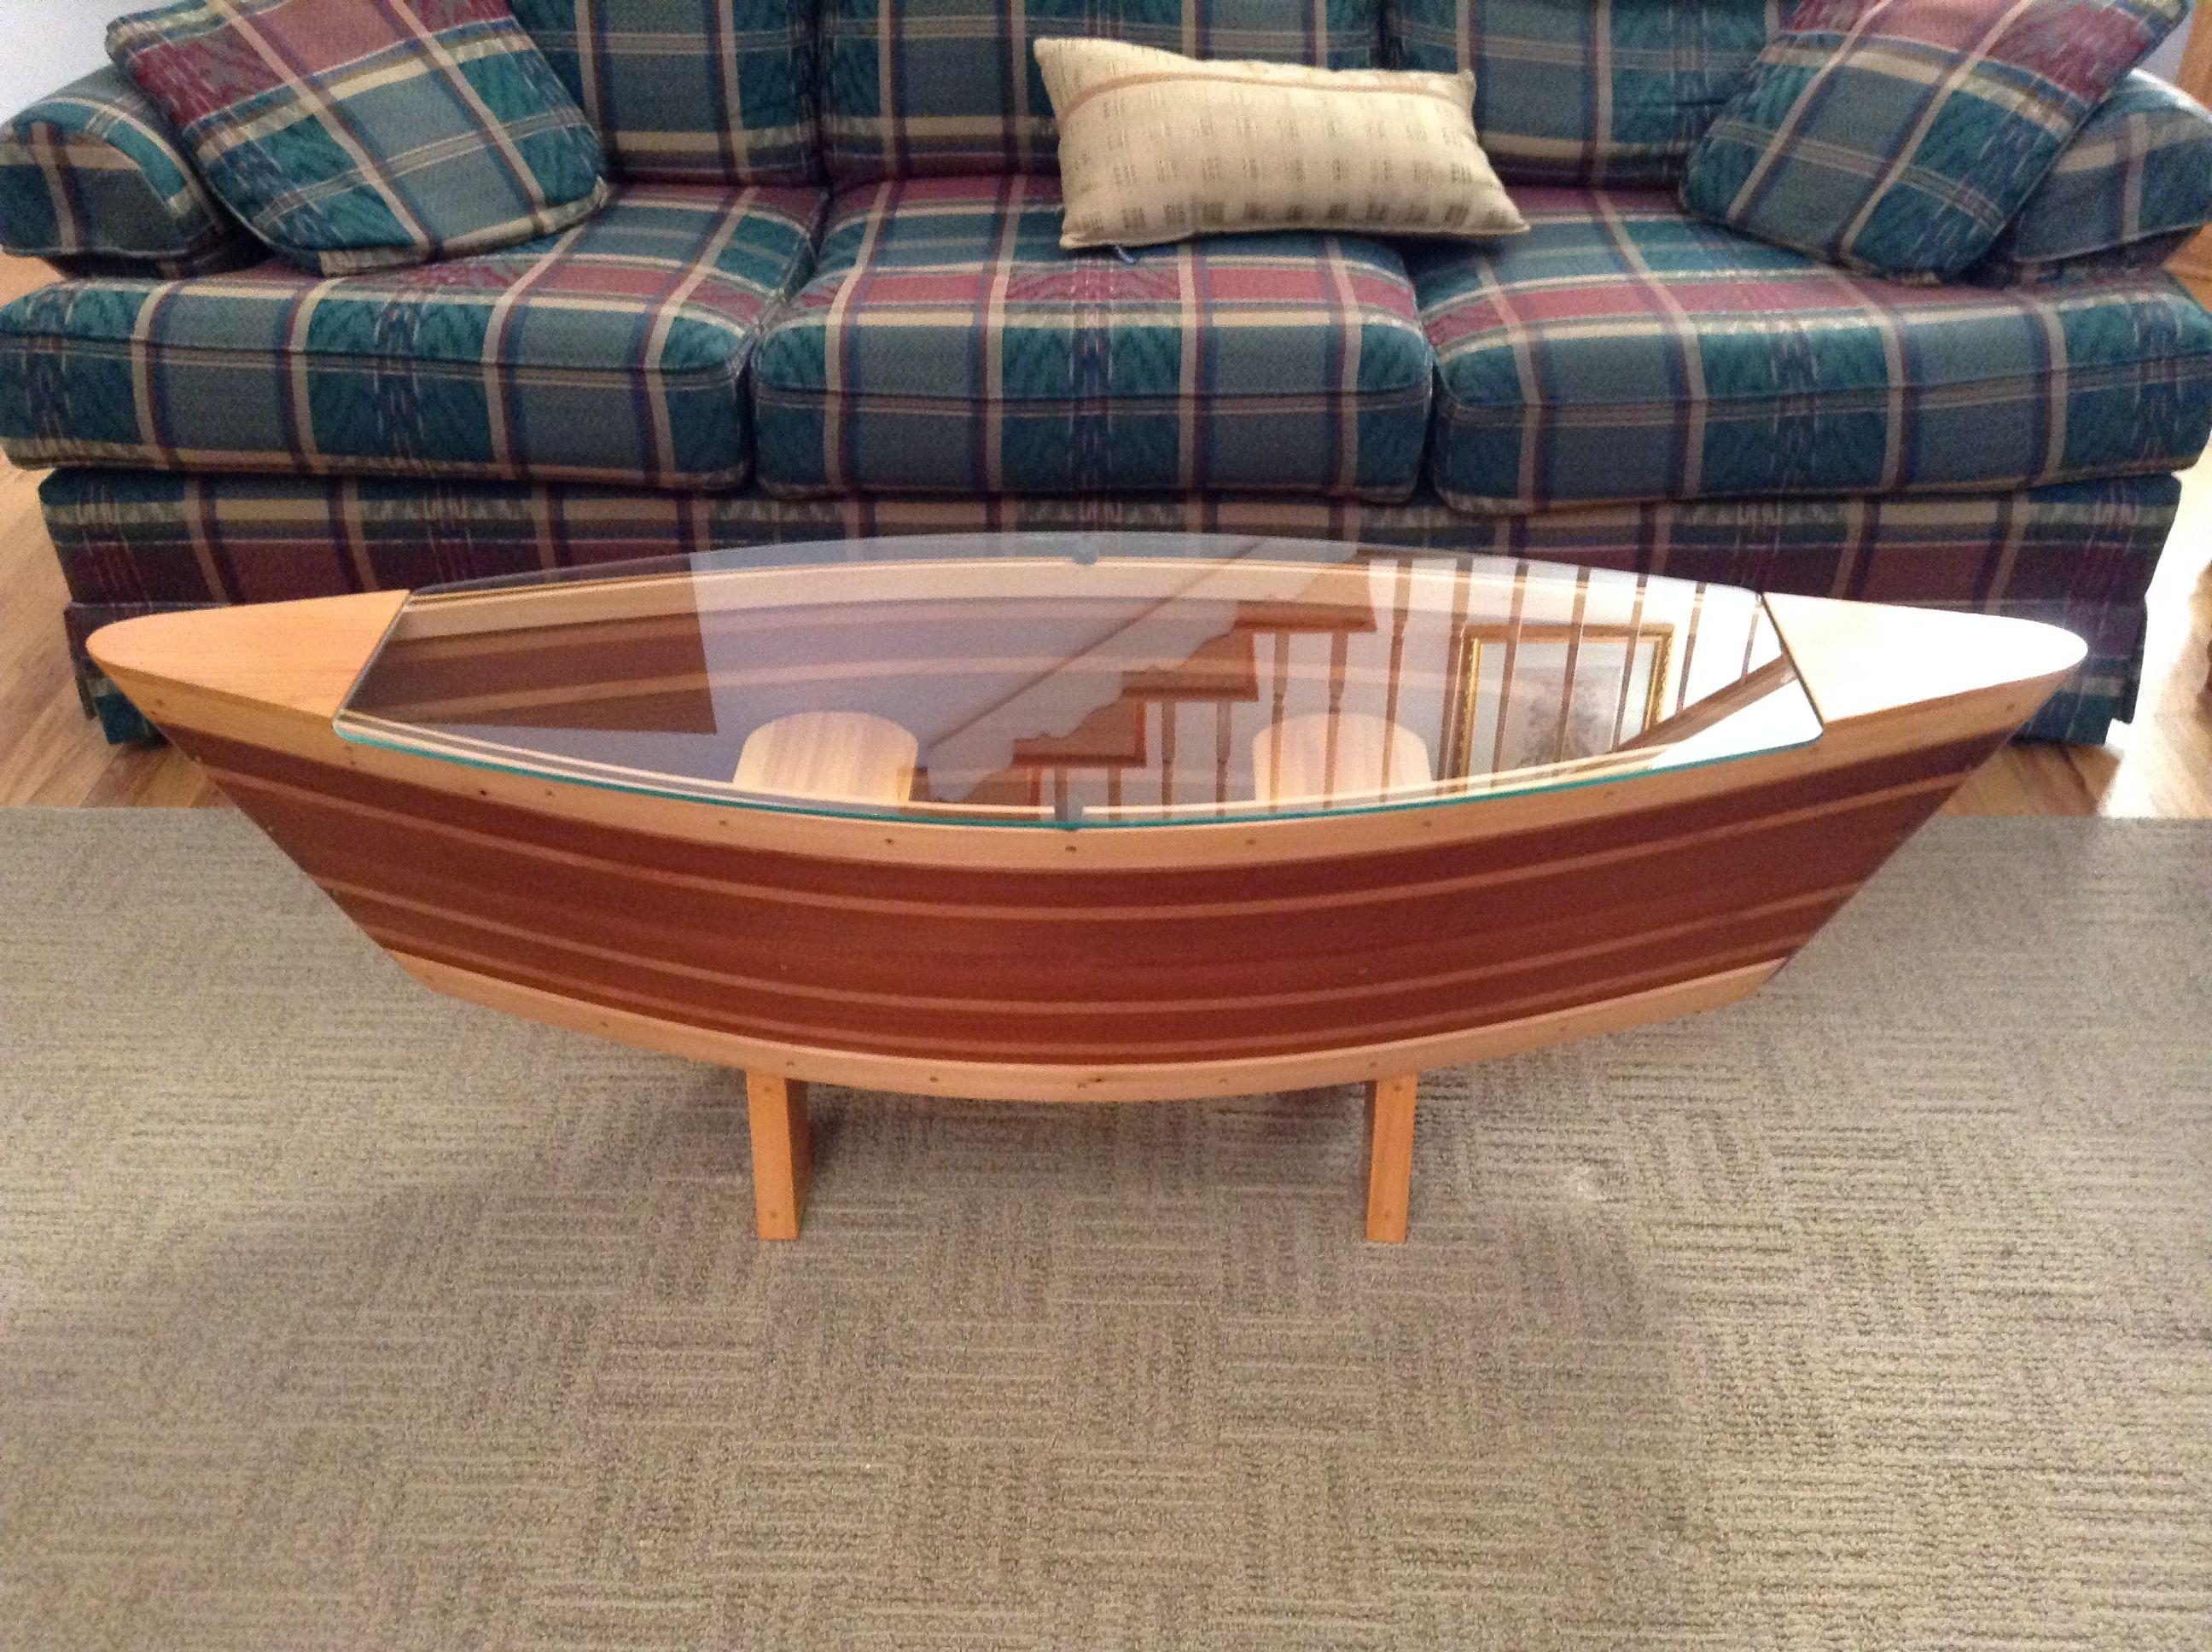 Canoe Coffee Table Boat Shelf 5ft Canoe Shaped Coffee Sofa Table regarding size 2592 X 1936